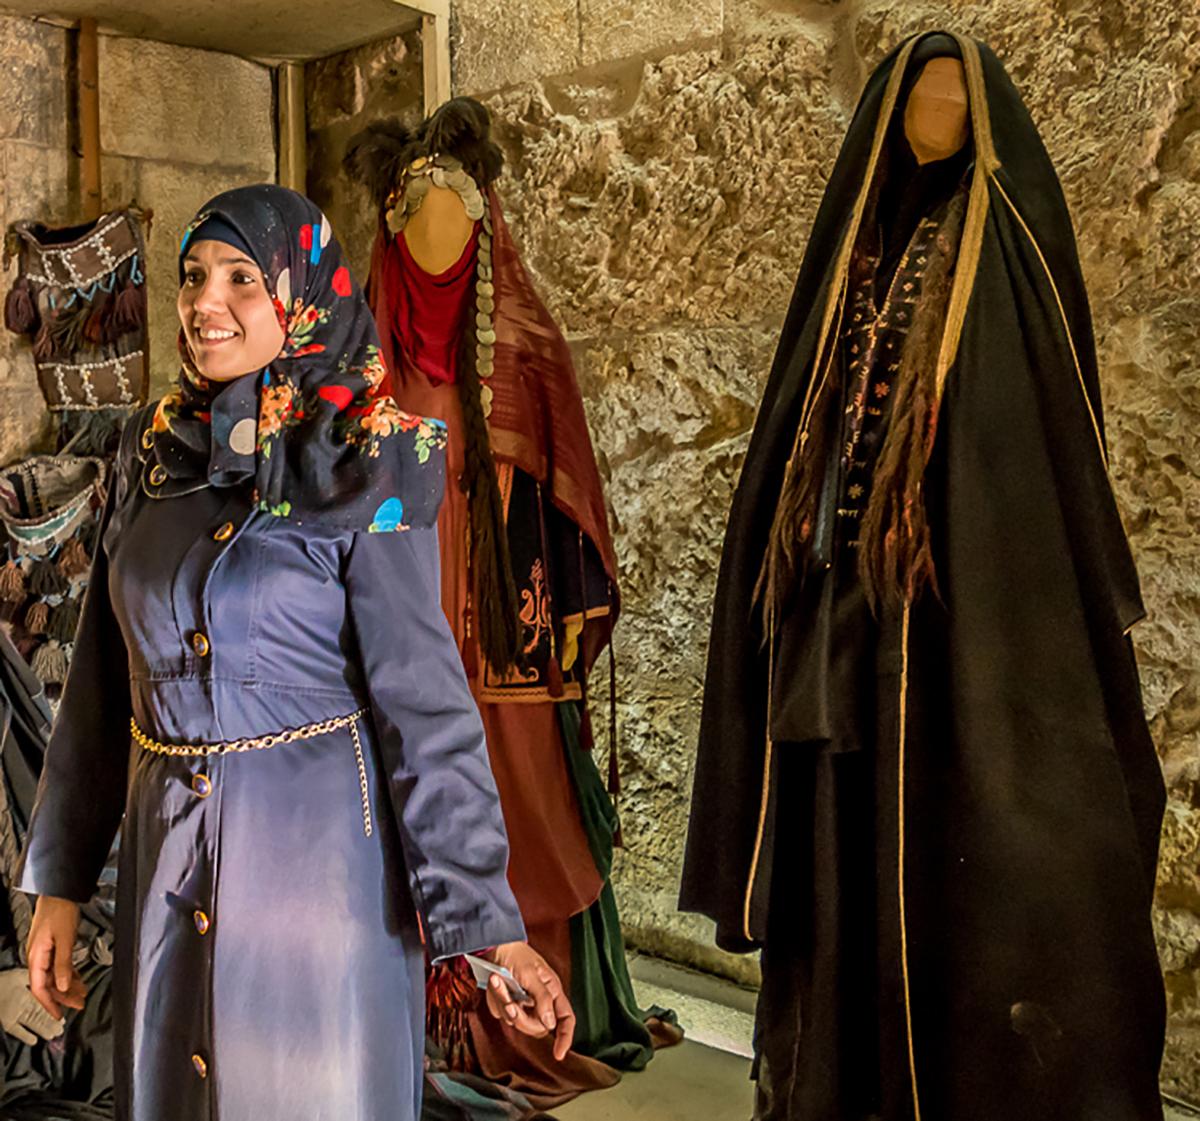 Innovative Jordanian Women Dress Code  Wwwimgarcadecom  Online Image Arcade